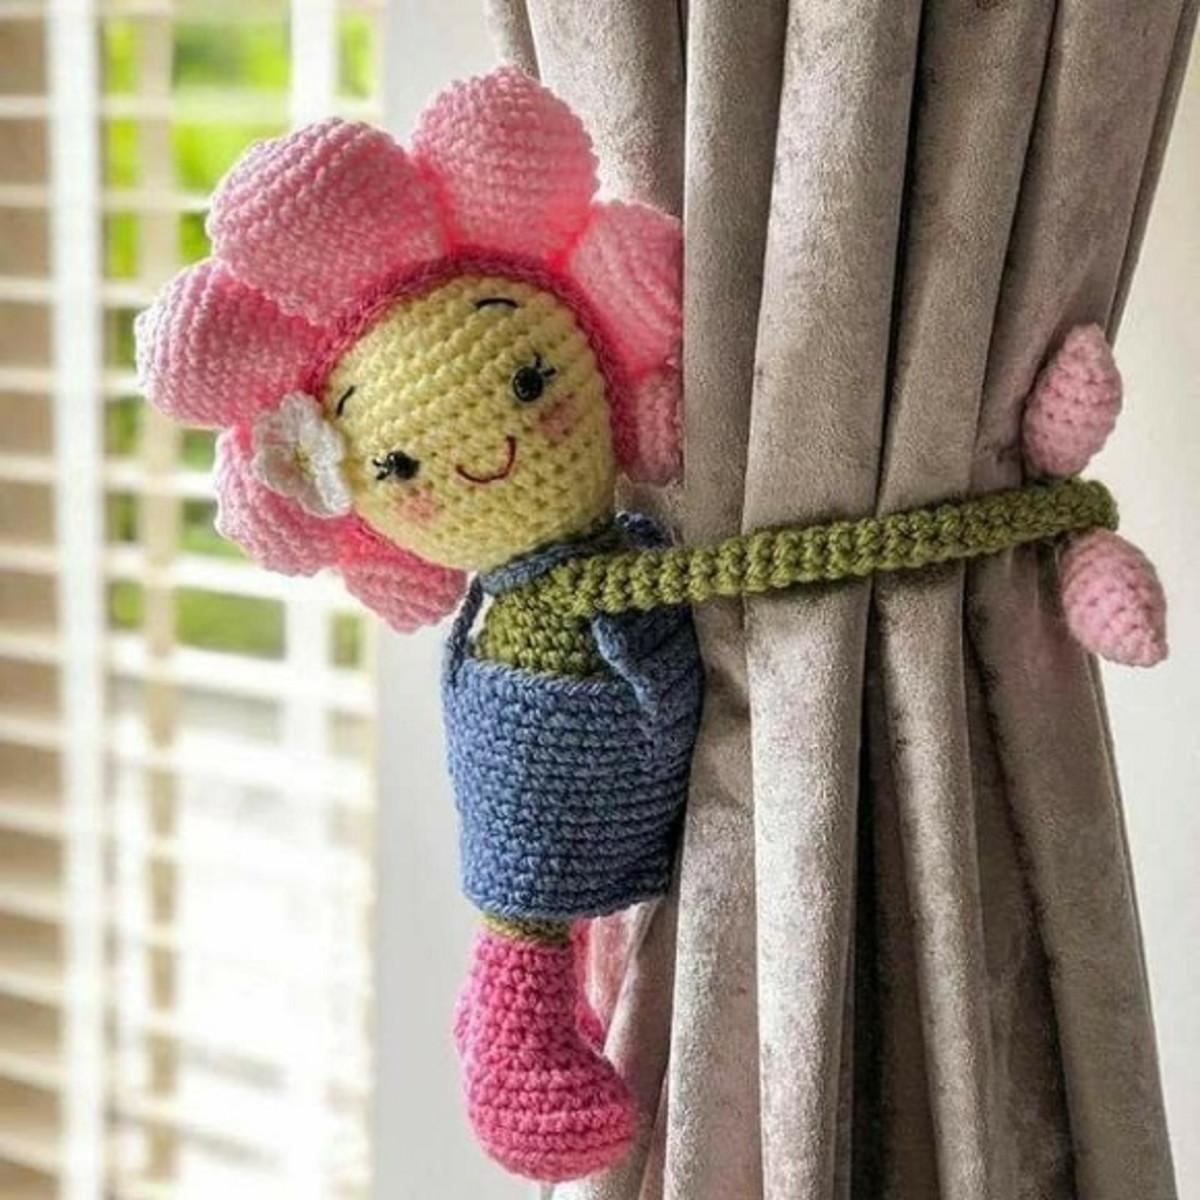 Fleurs en crochet - Rose | Flor de crochet, Decoração de crochê ... | 1200x1200